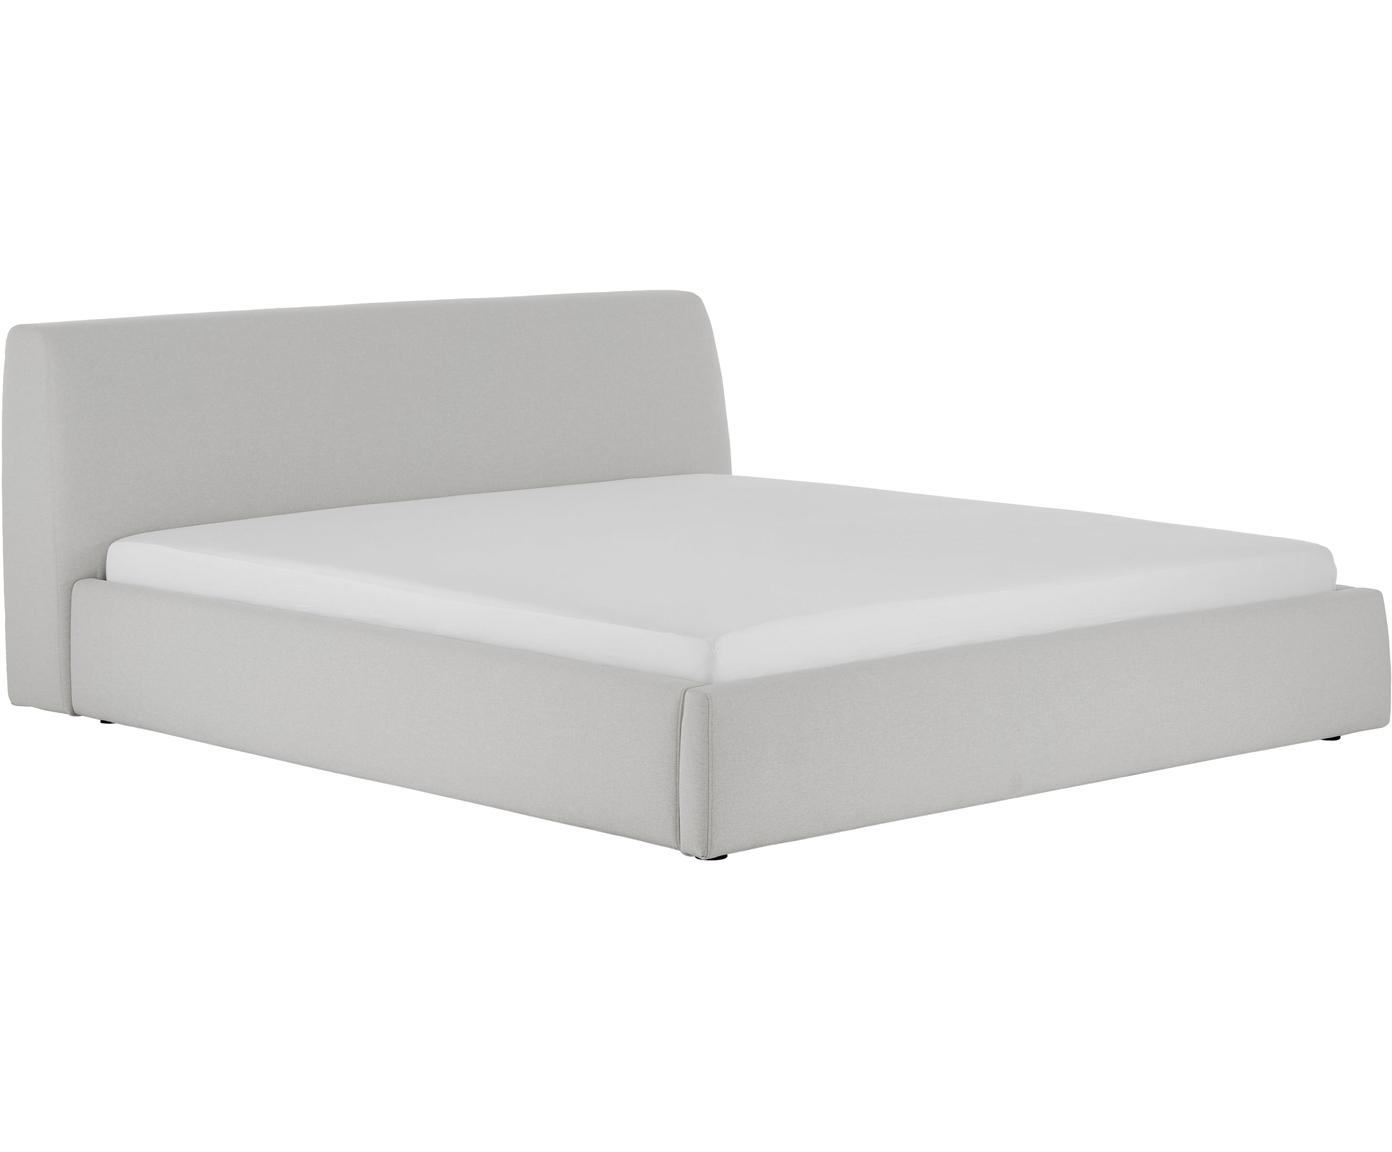 Gestoffeerd bed Cloud met opbergruimte, Frame: massief grenenhout, Bekleding: polyester (structuurmater, Lichtgrijs, 160 x 200 cm